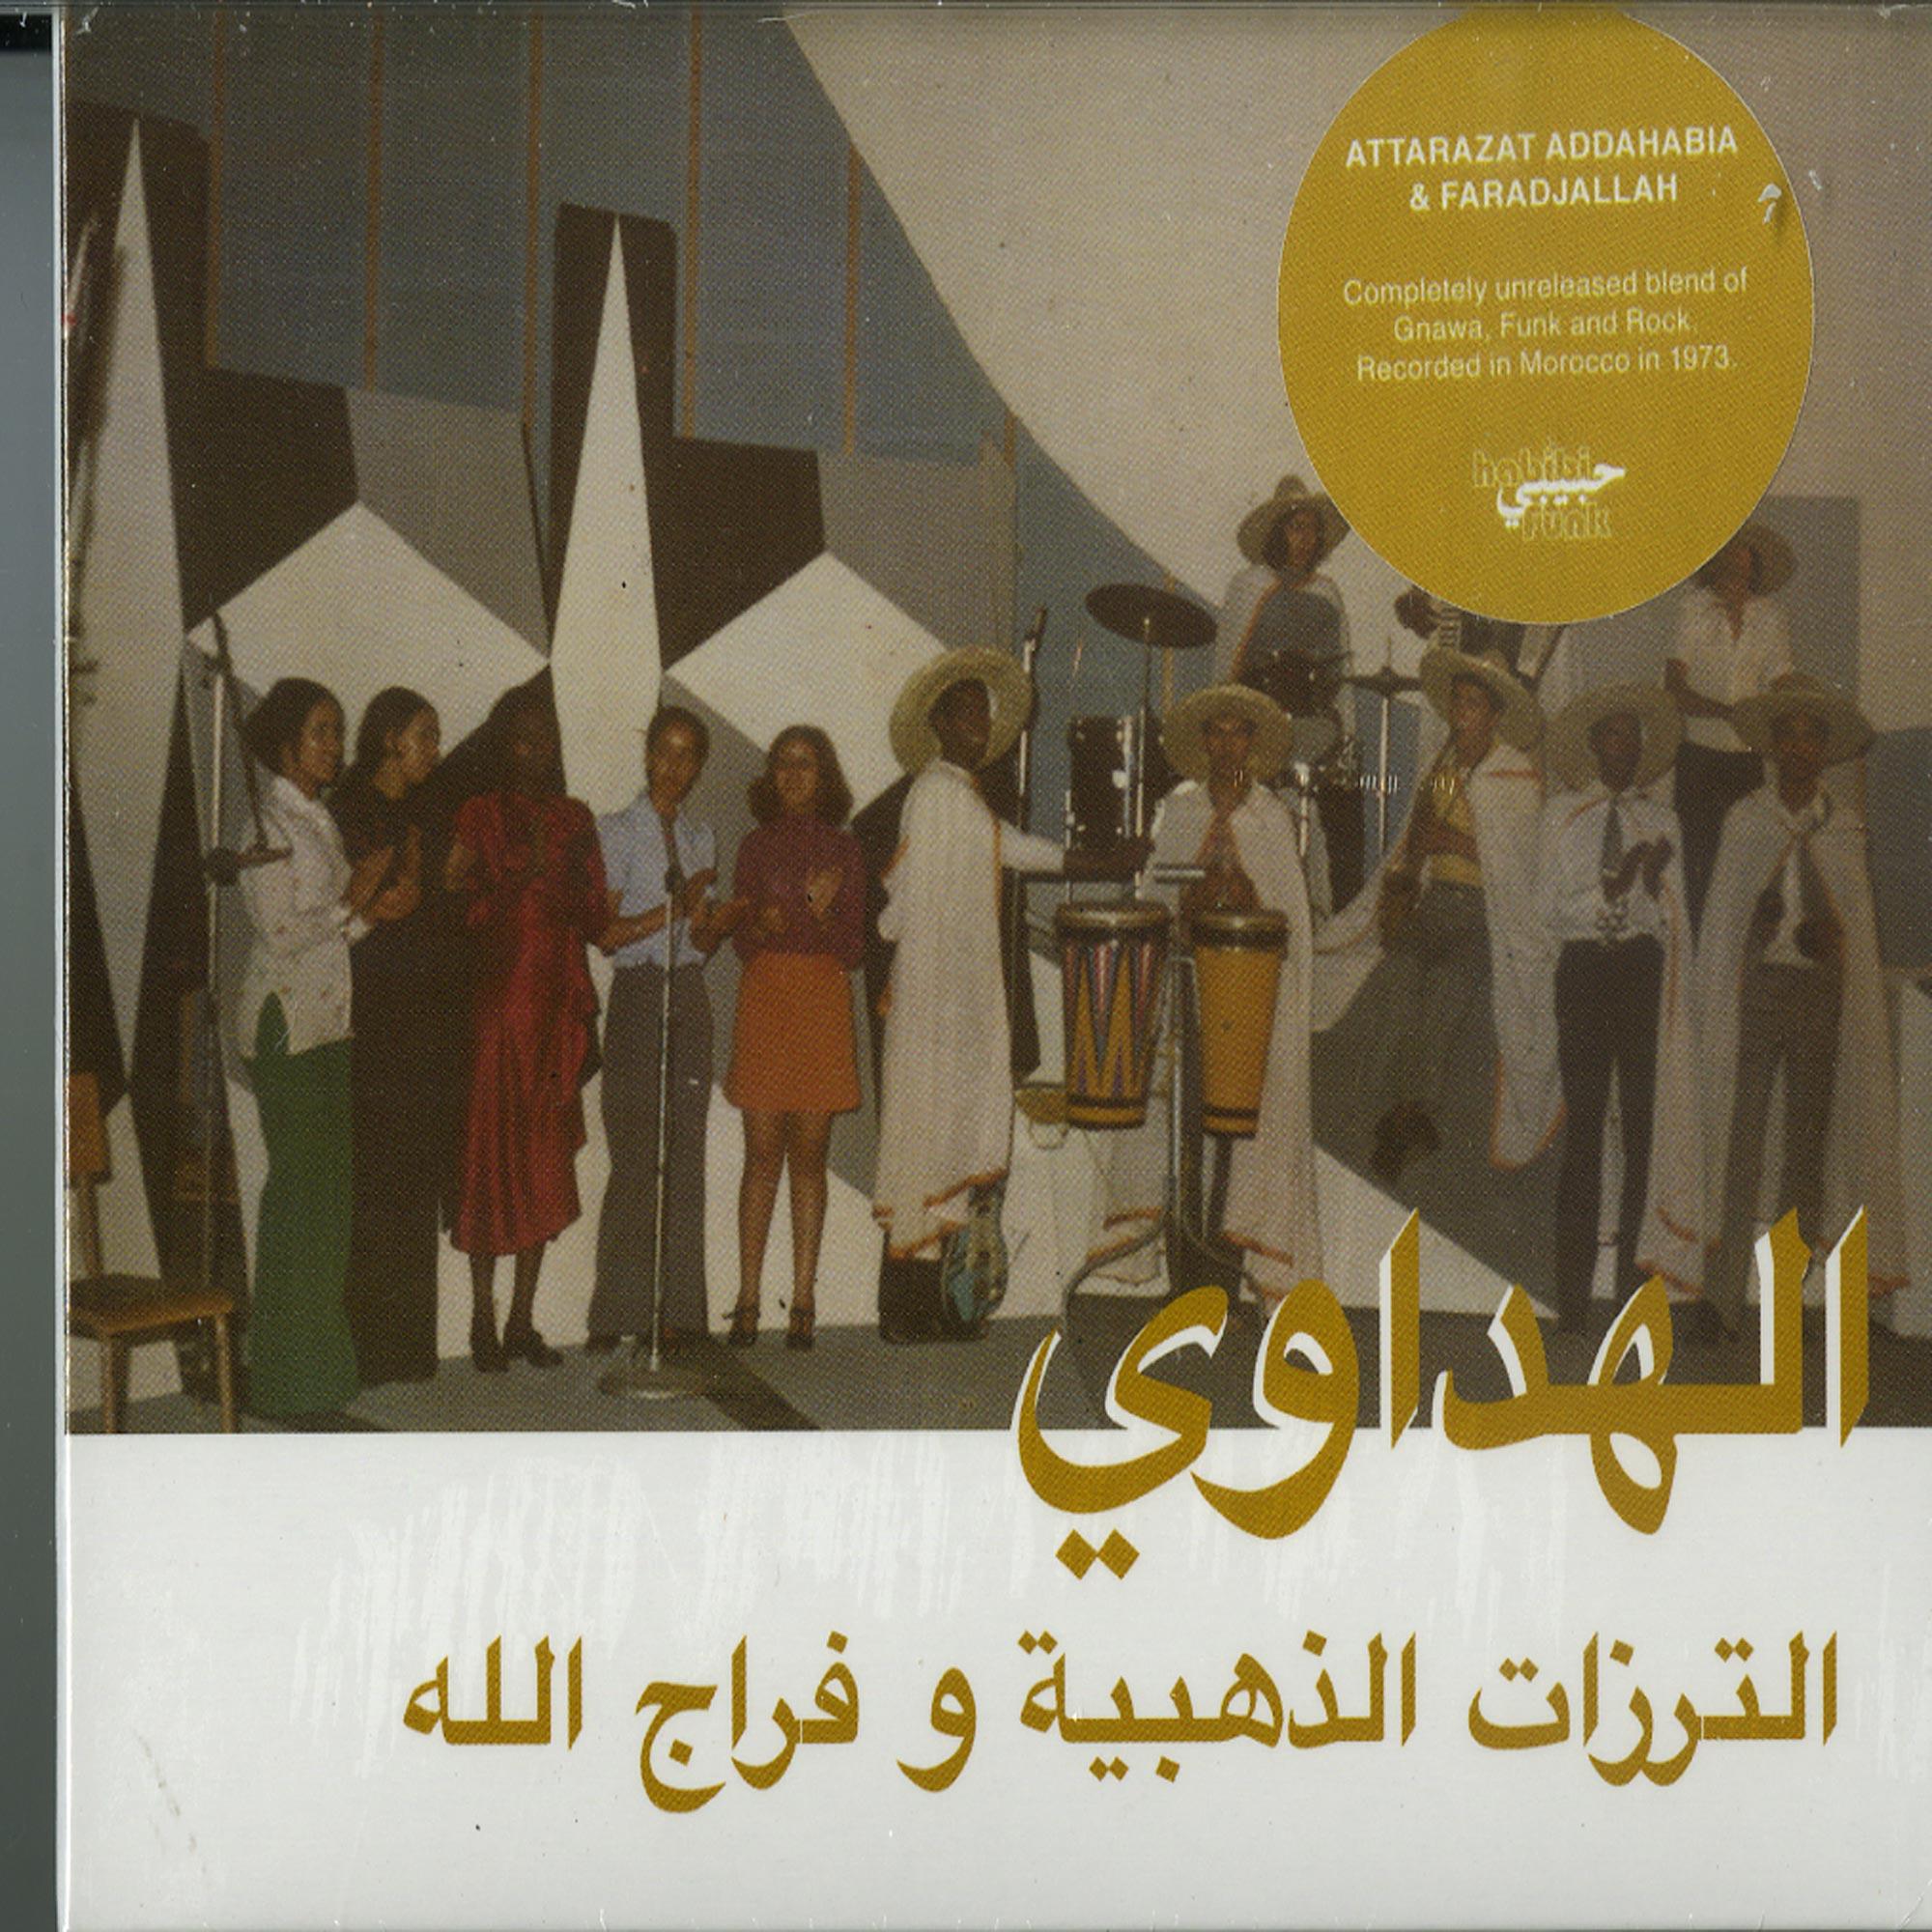 Attarazat Addahabia & Faradjallah - AL HADAOUI